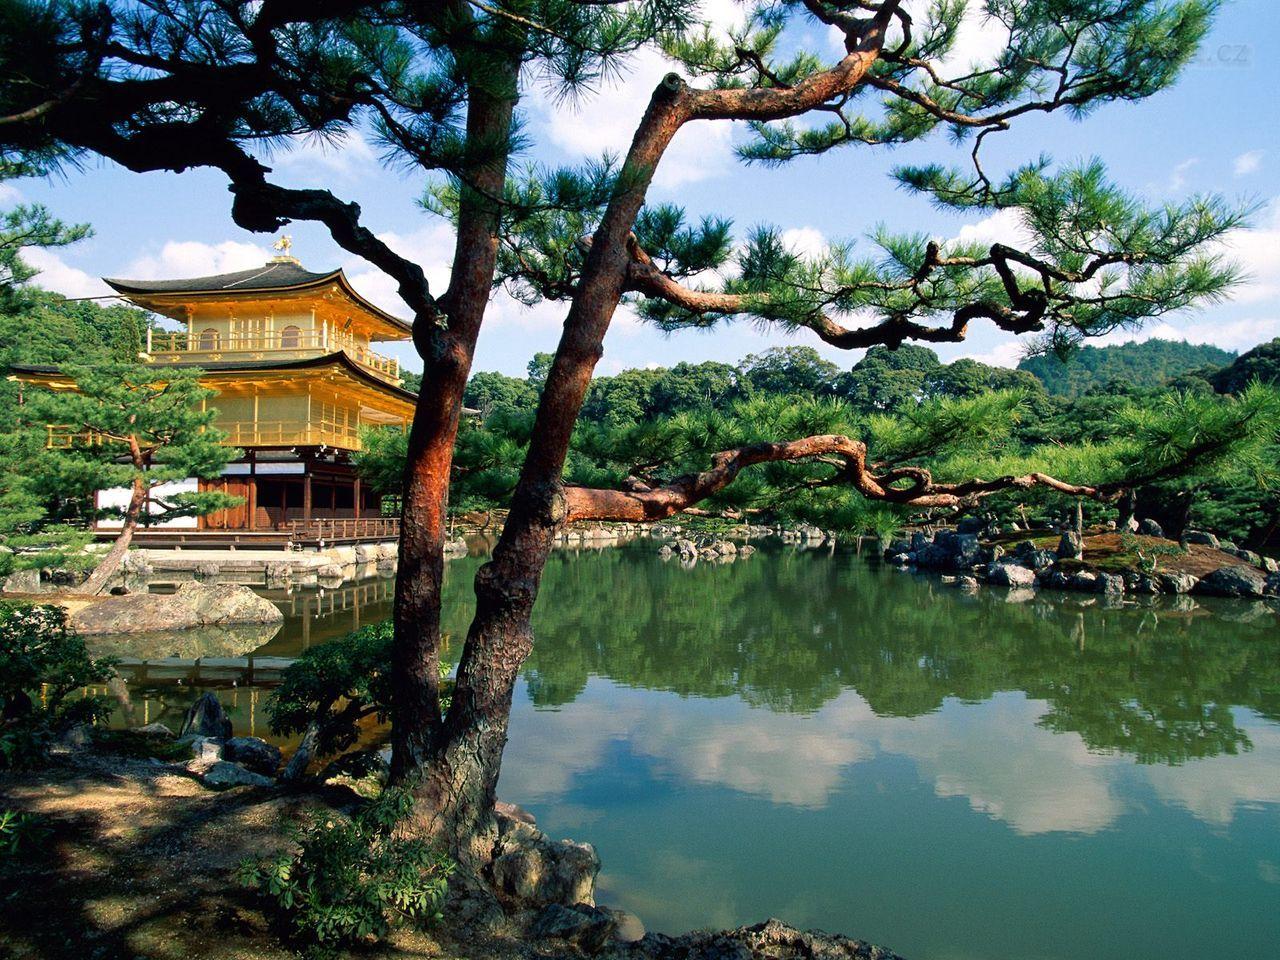 http://www.celysvet.cz/krasne-fotky/staty/80/kinkaku-ji-temple--kyoto--japan.jpg